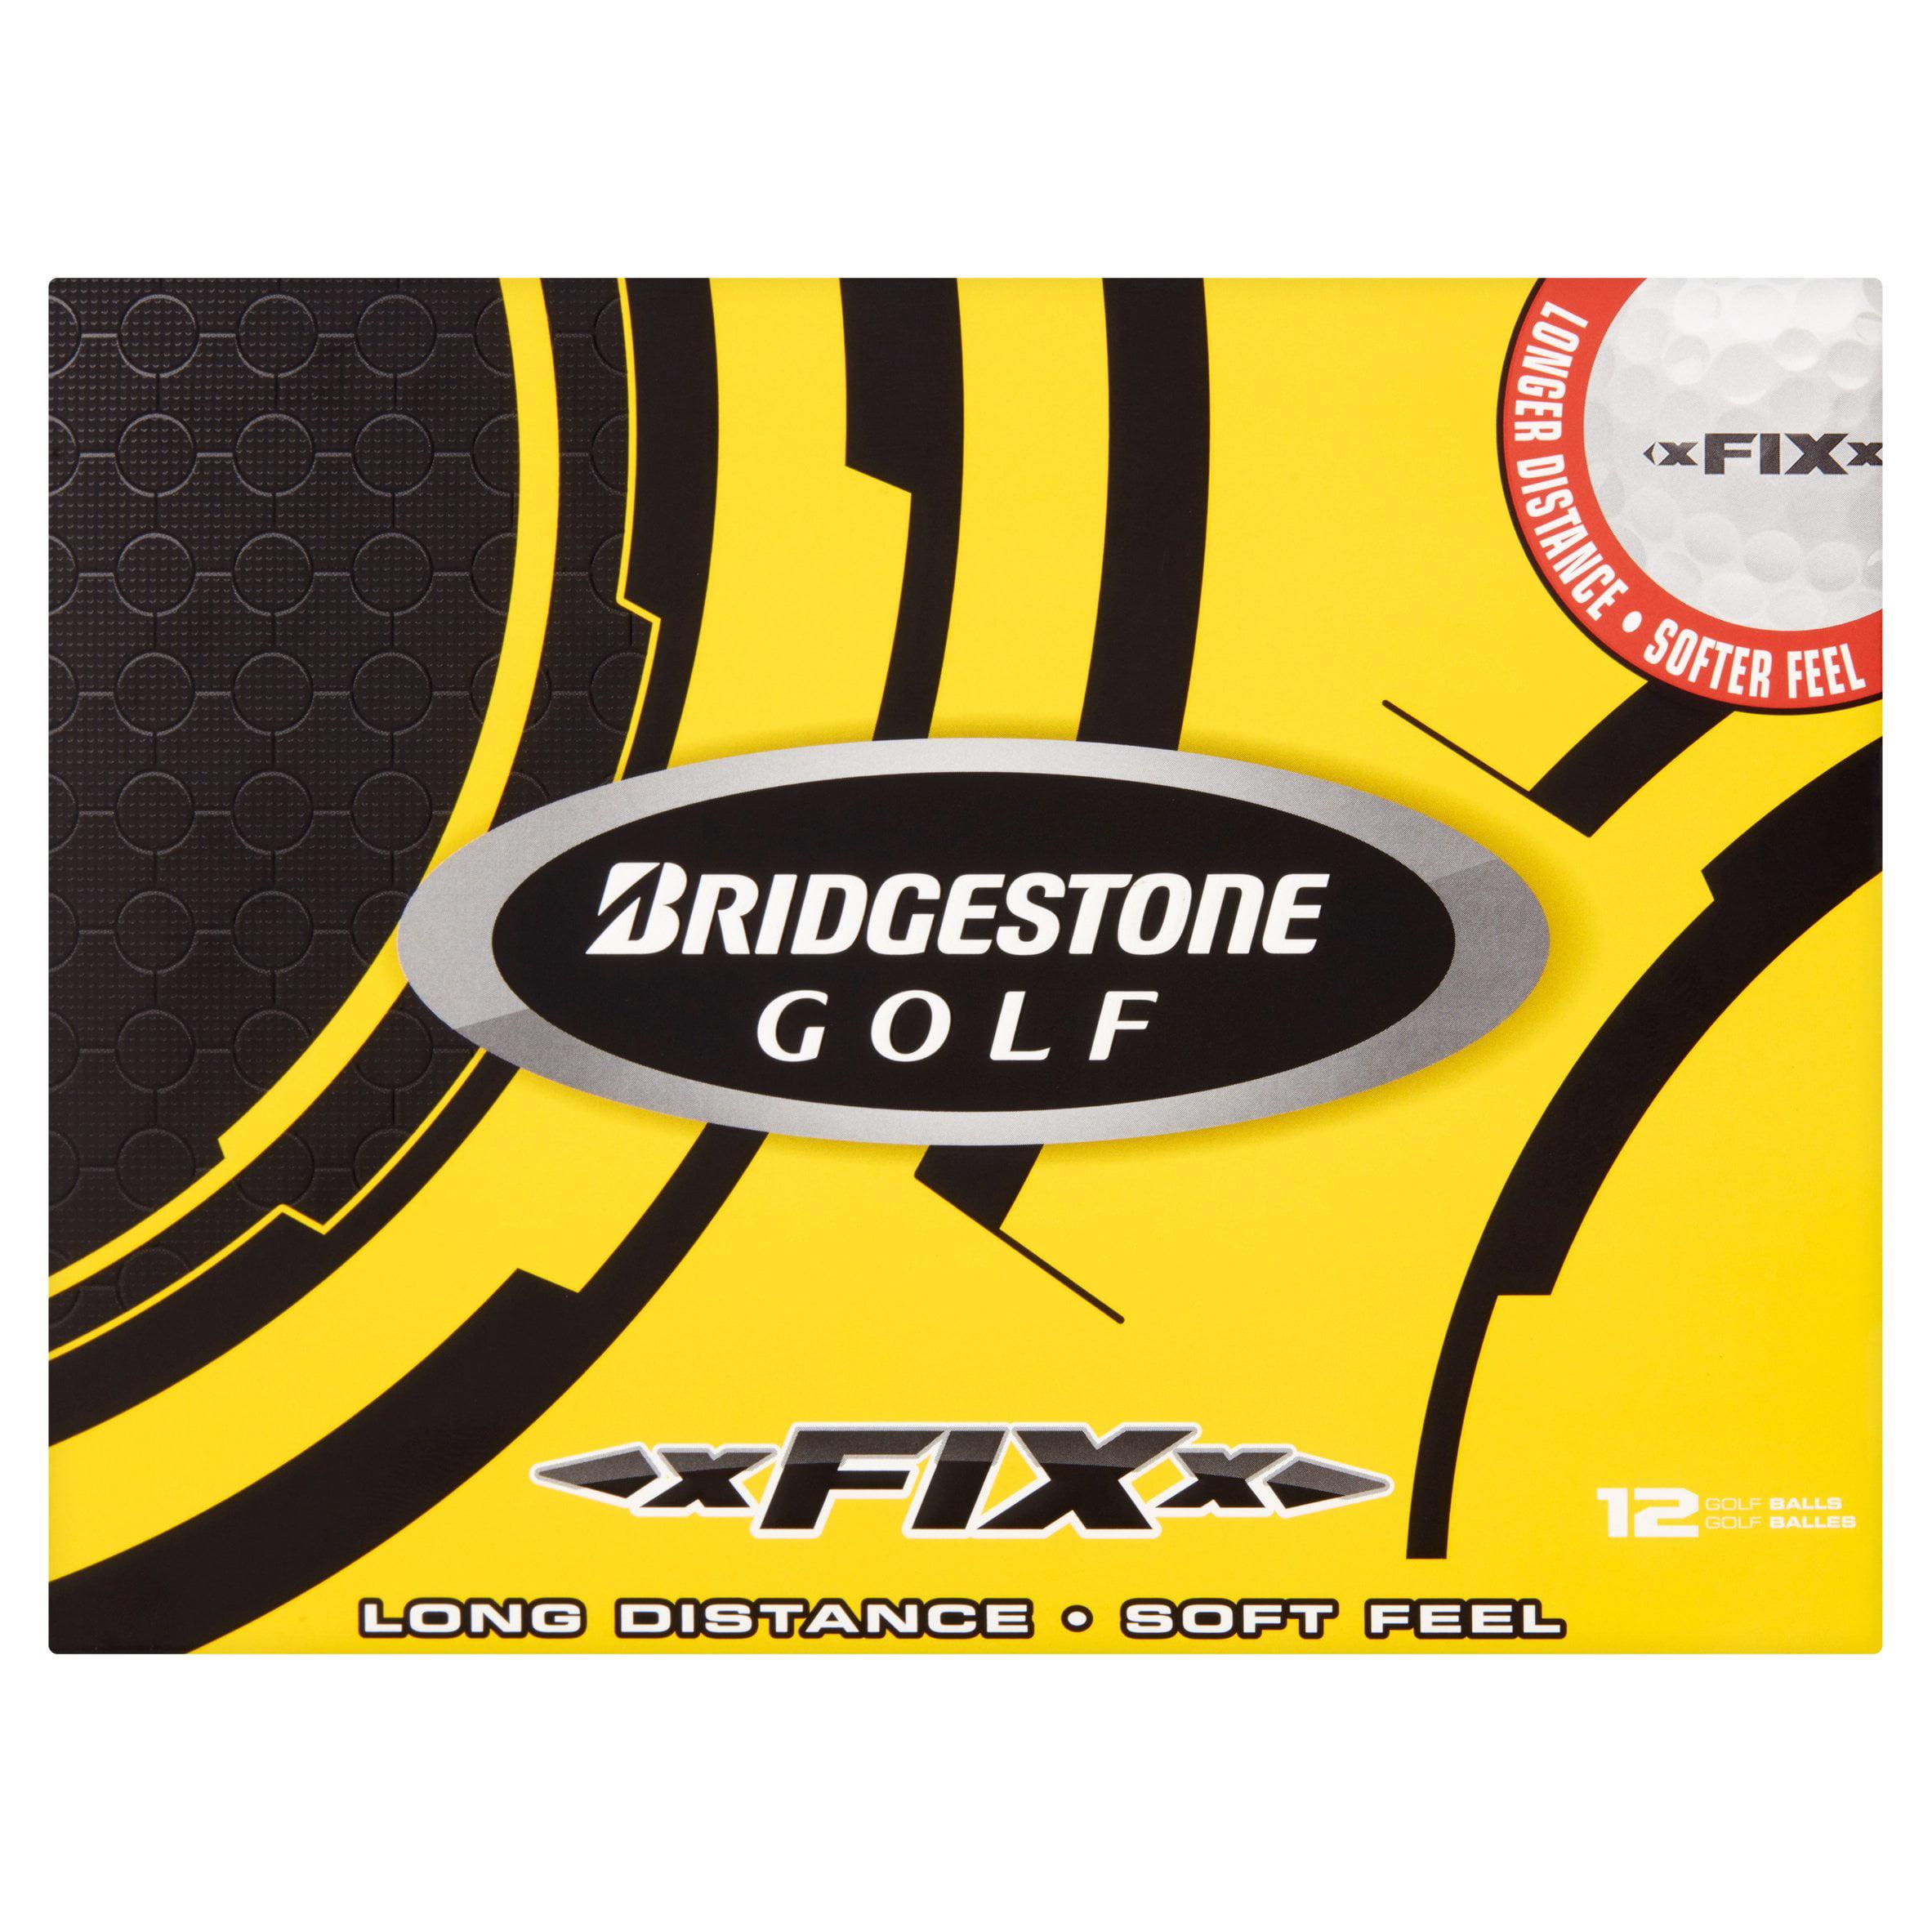 Bridgestone Fix 12 Golf Balls by Bridgestone Golf, Inc.